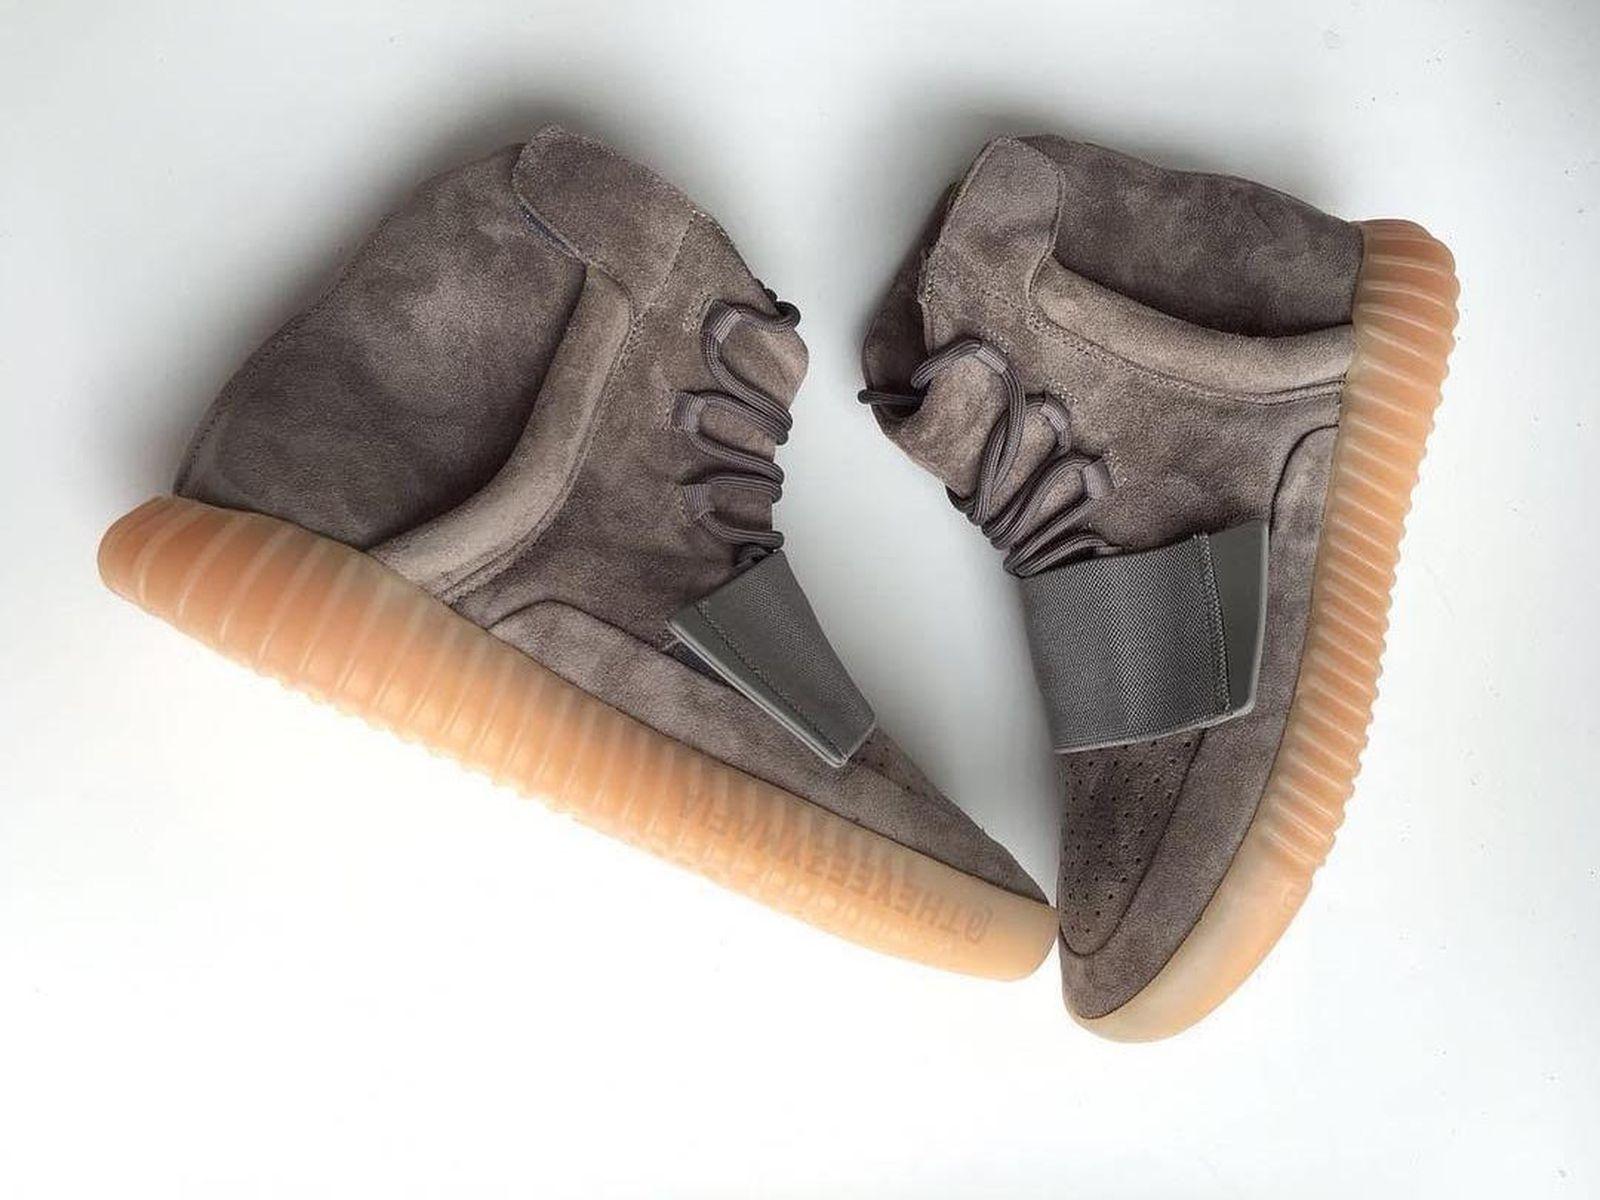 adidas-yeezy-boost-750-light-brown-1